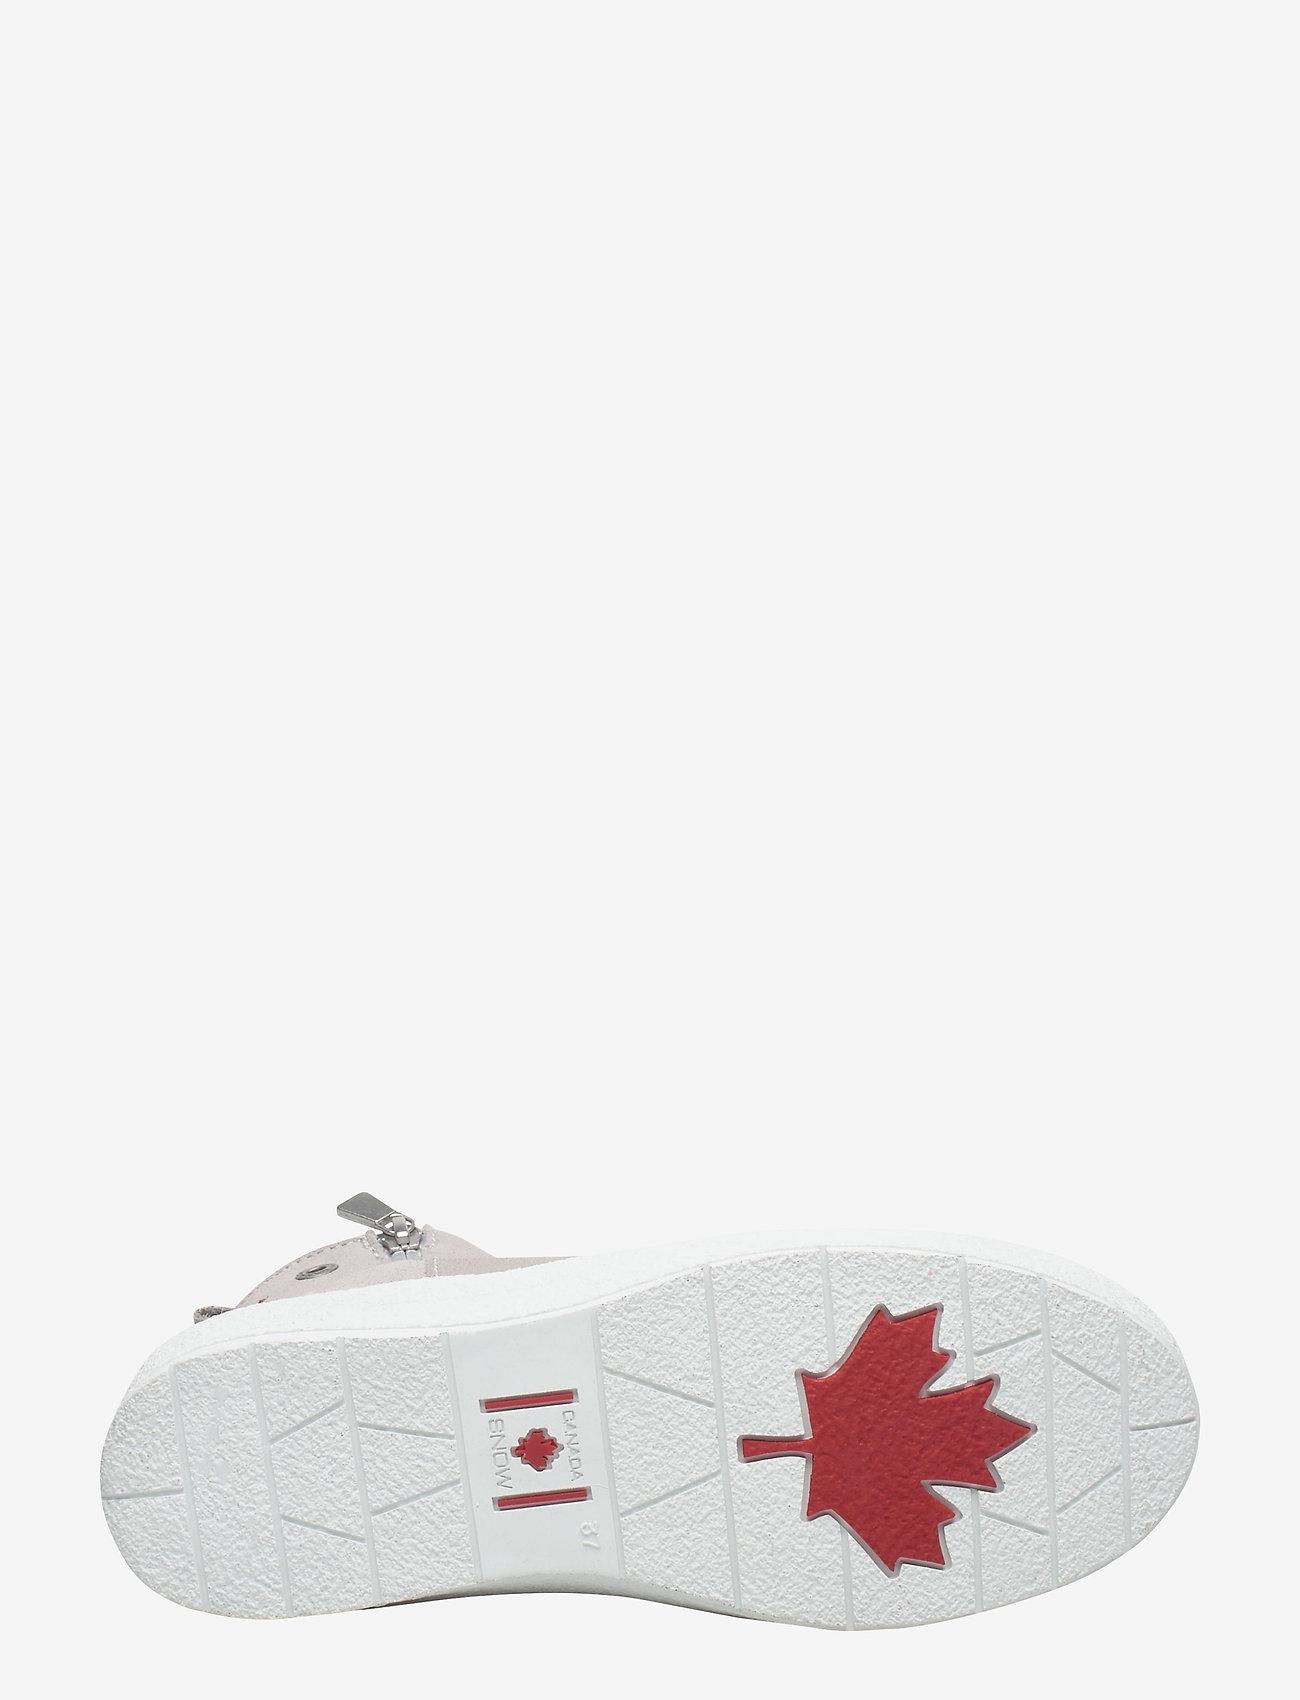 Mount Baker (Grey) - Canada Snow